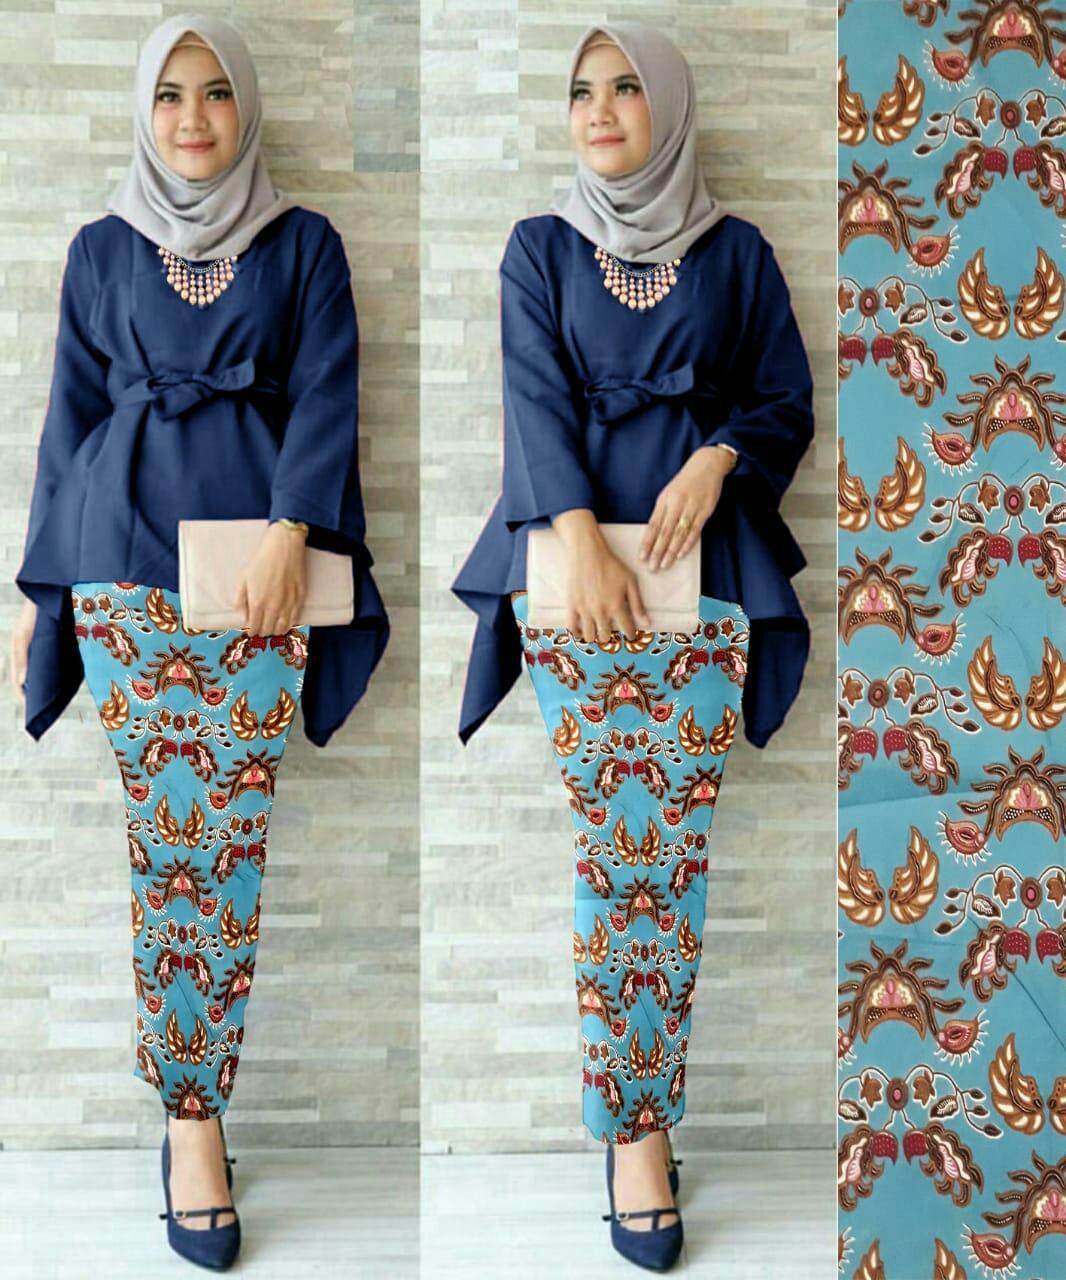 J&C Setelan Kebaya Bluely Pitha /  Atasan Wolpeach / Rok Batik Prada / Setelan Kebaya 2 in 1 / Baju Pesta / Kebaya Muslim / Rok Panjang Batik / Rok Batik / Baju Muslim / Hijab Style / Hijab Fashion